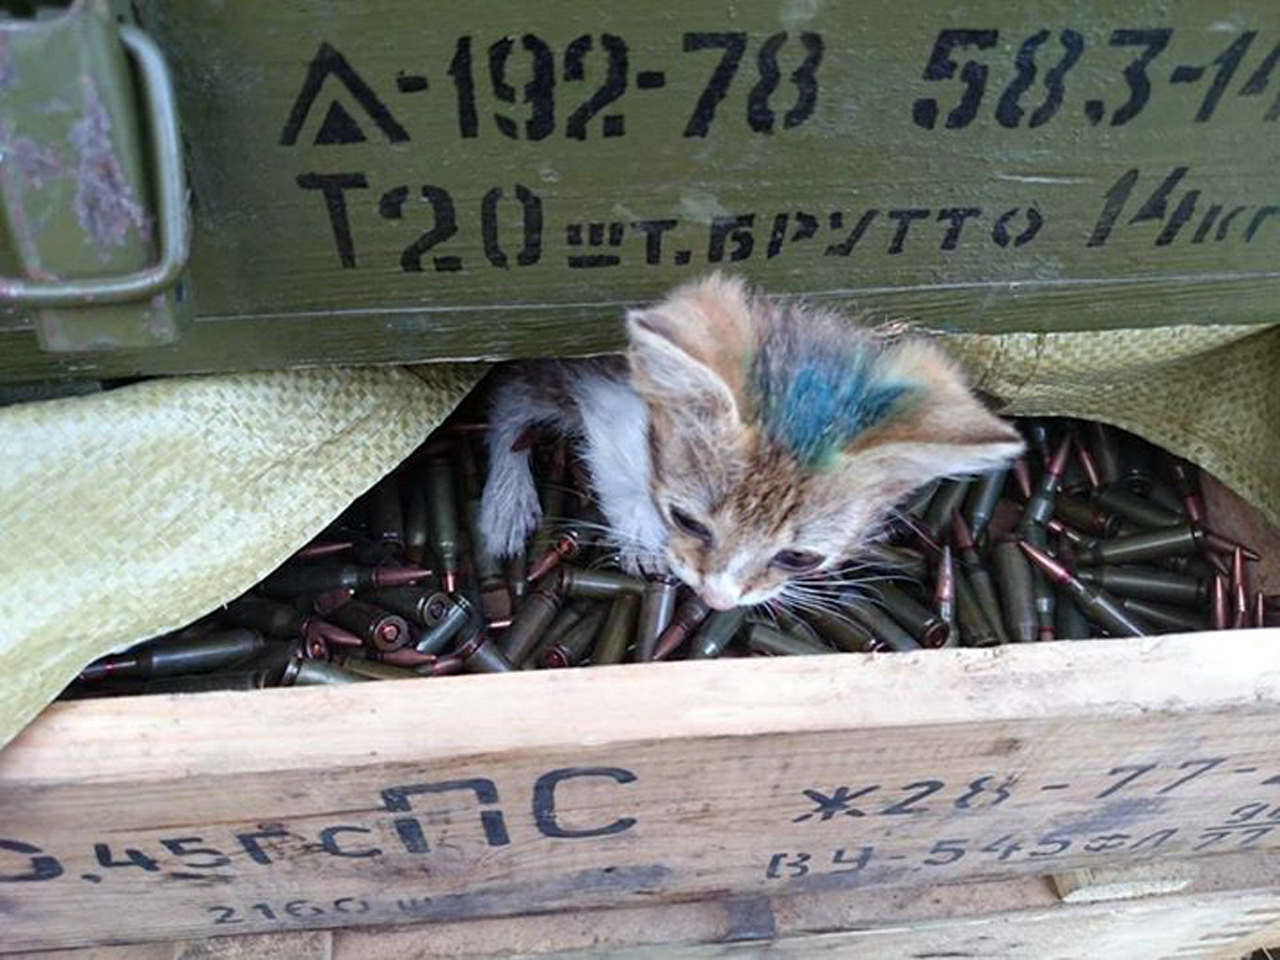 За що котам в АТО треба поставити пам'ятник-9 - фото 9